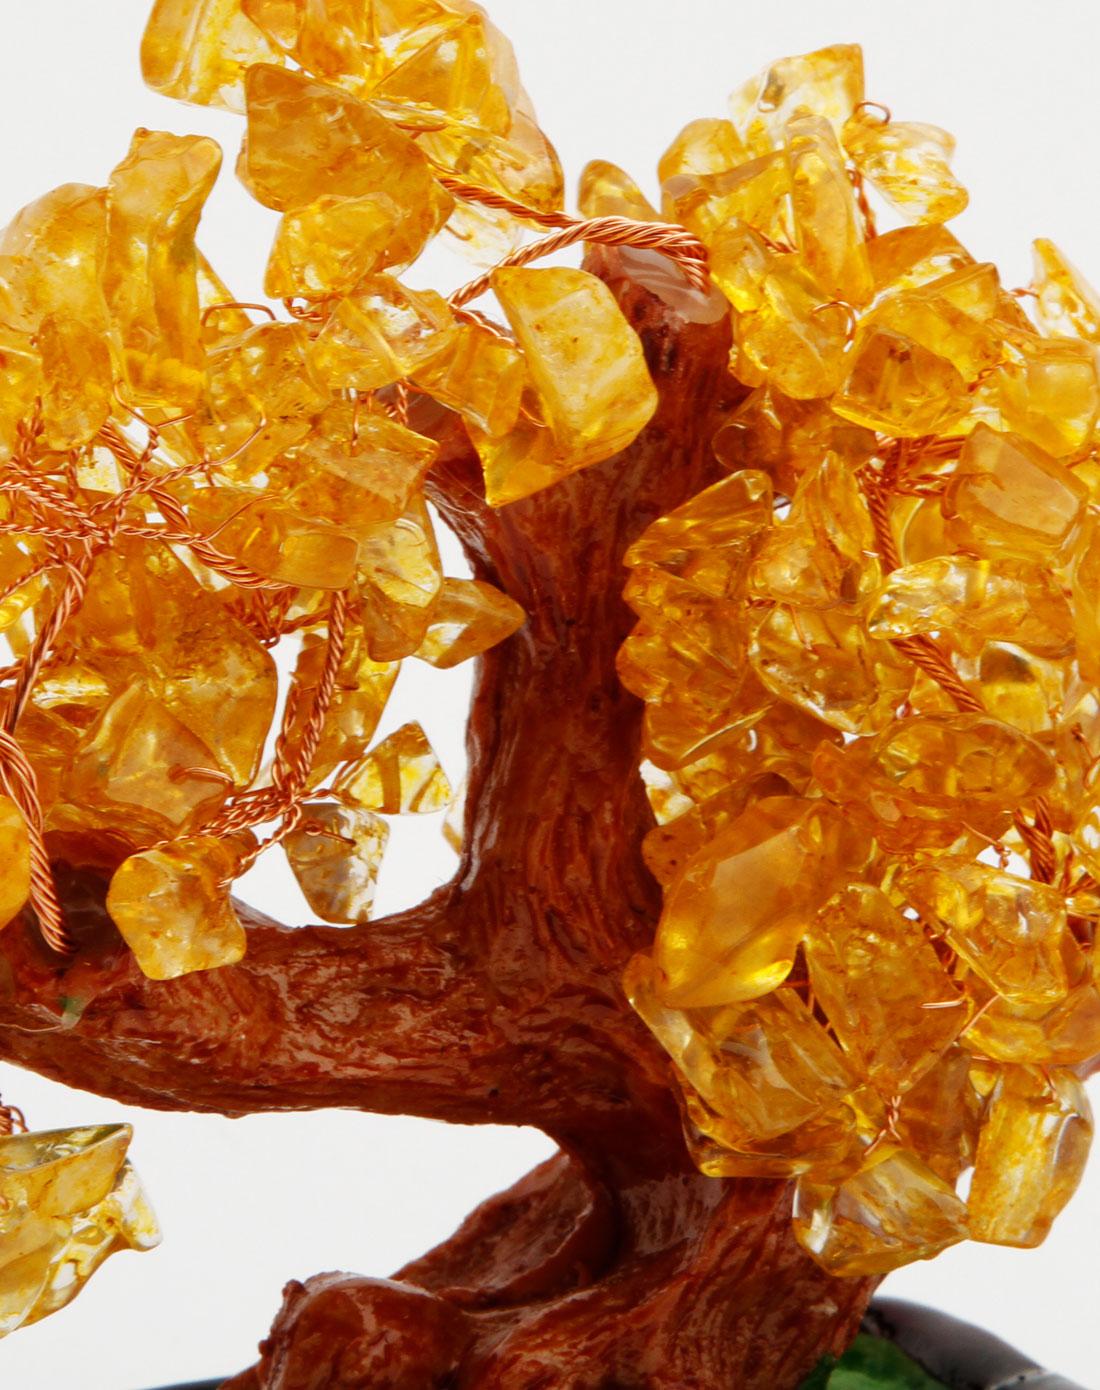 黄色玉石发财树